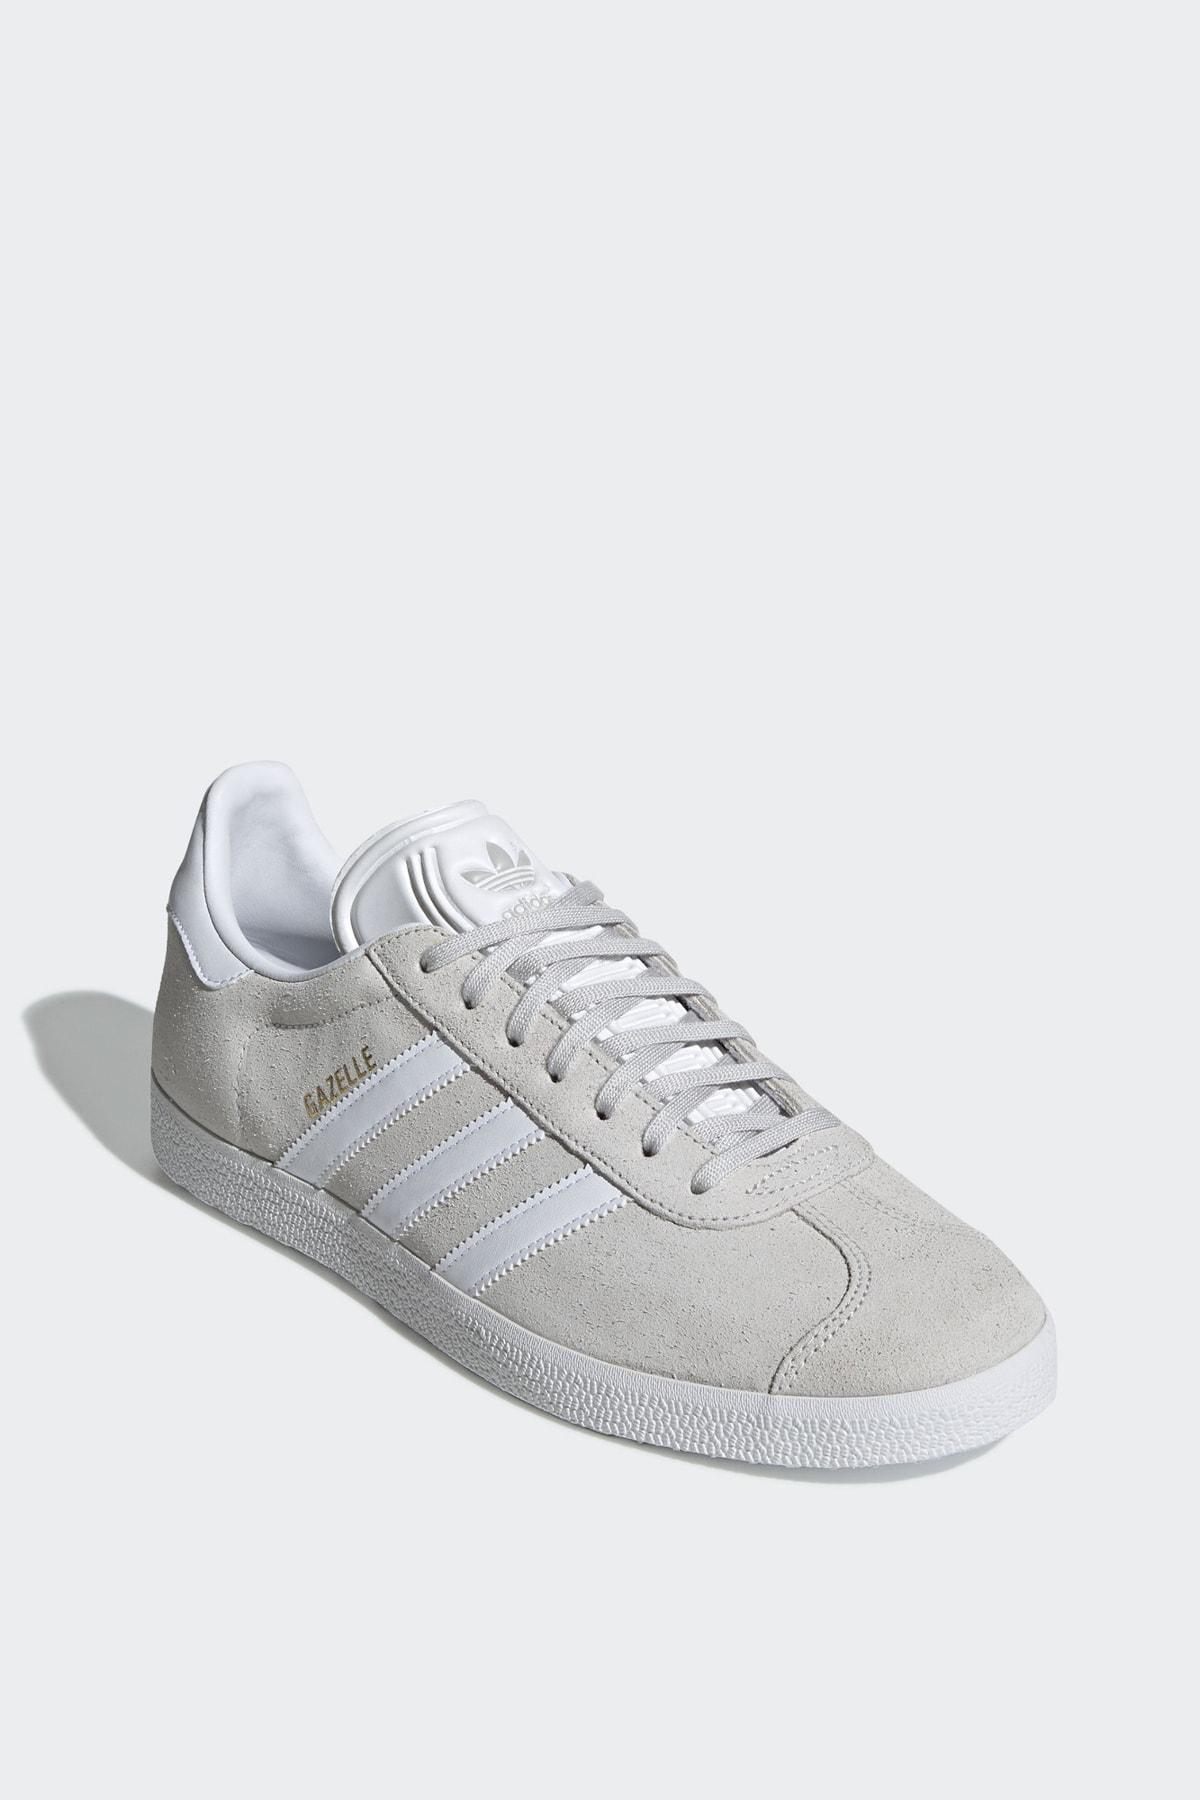 adidas Erkek Originals Spor Ayakkabı - Gazelle - F34053 2